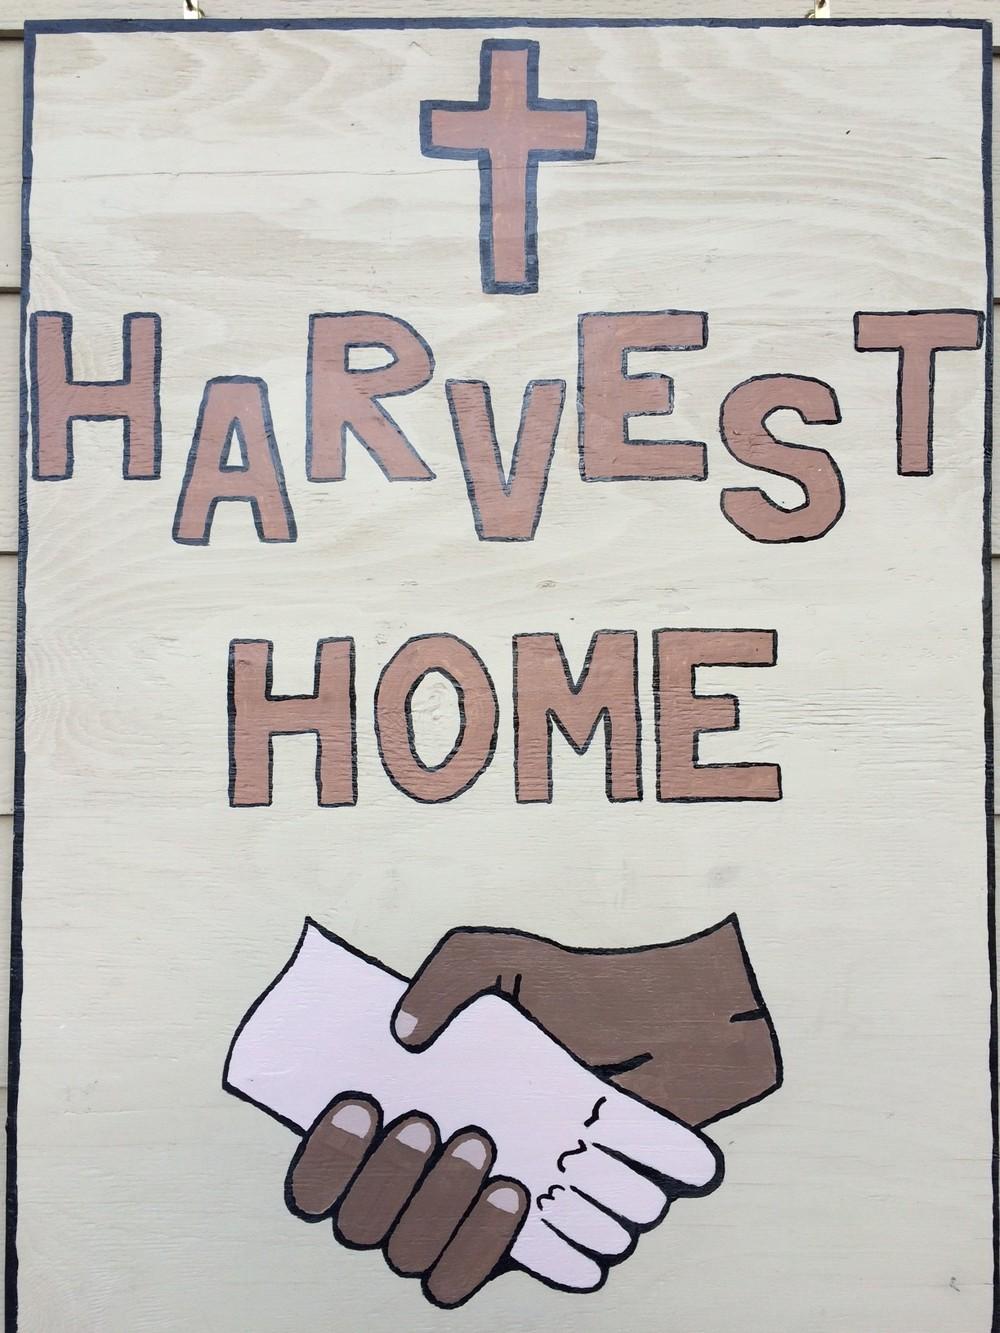 harvest home sign.JPG